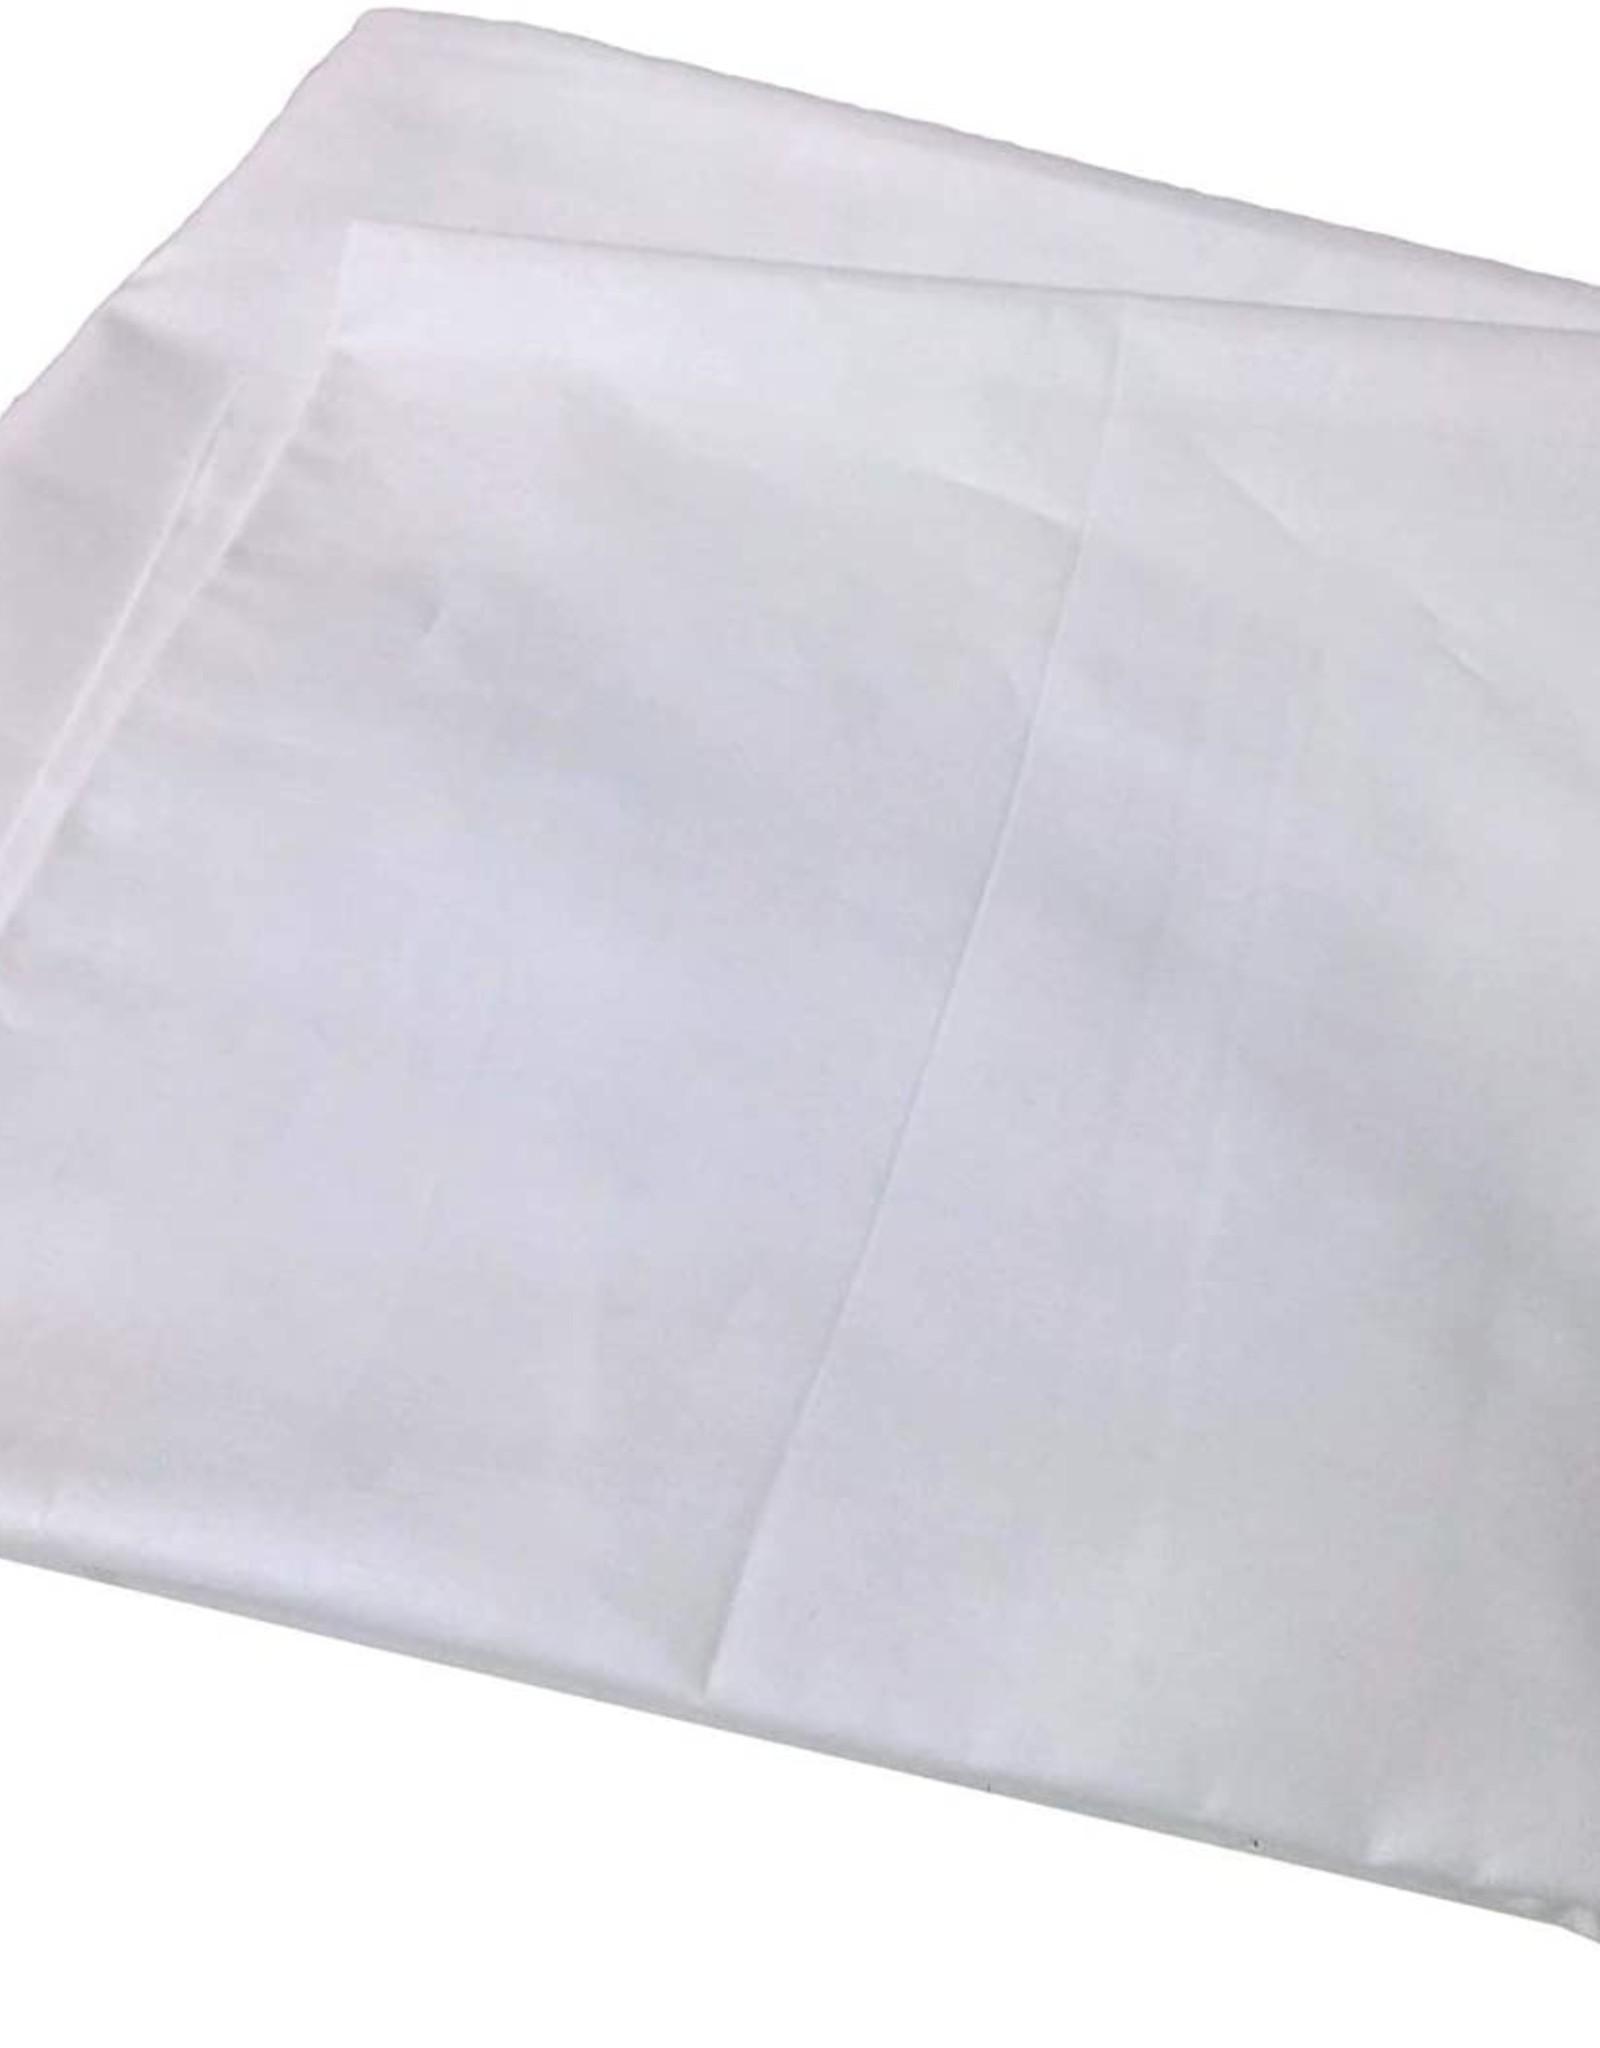 Sublimation Pillowcase